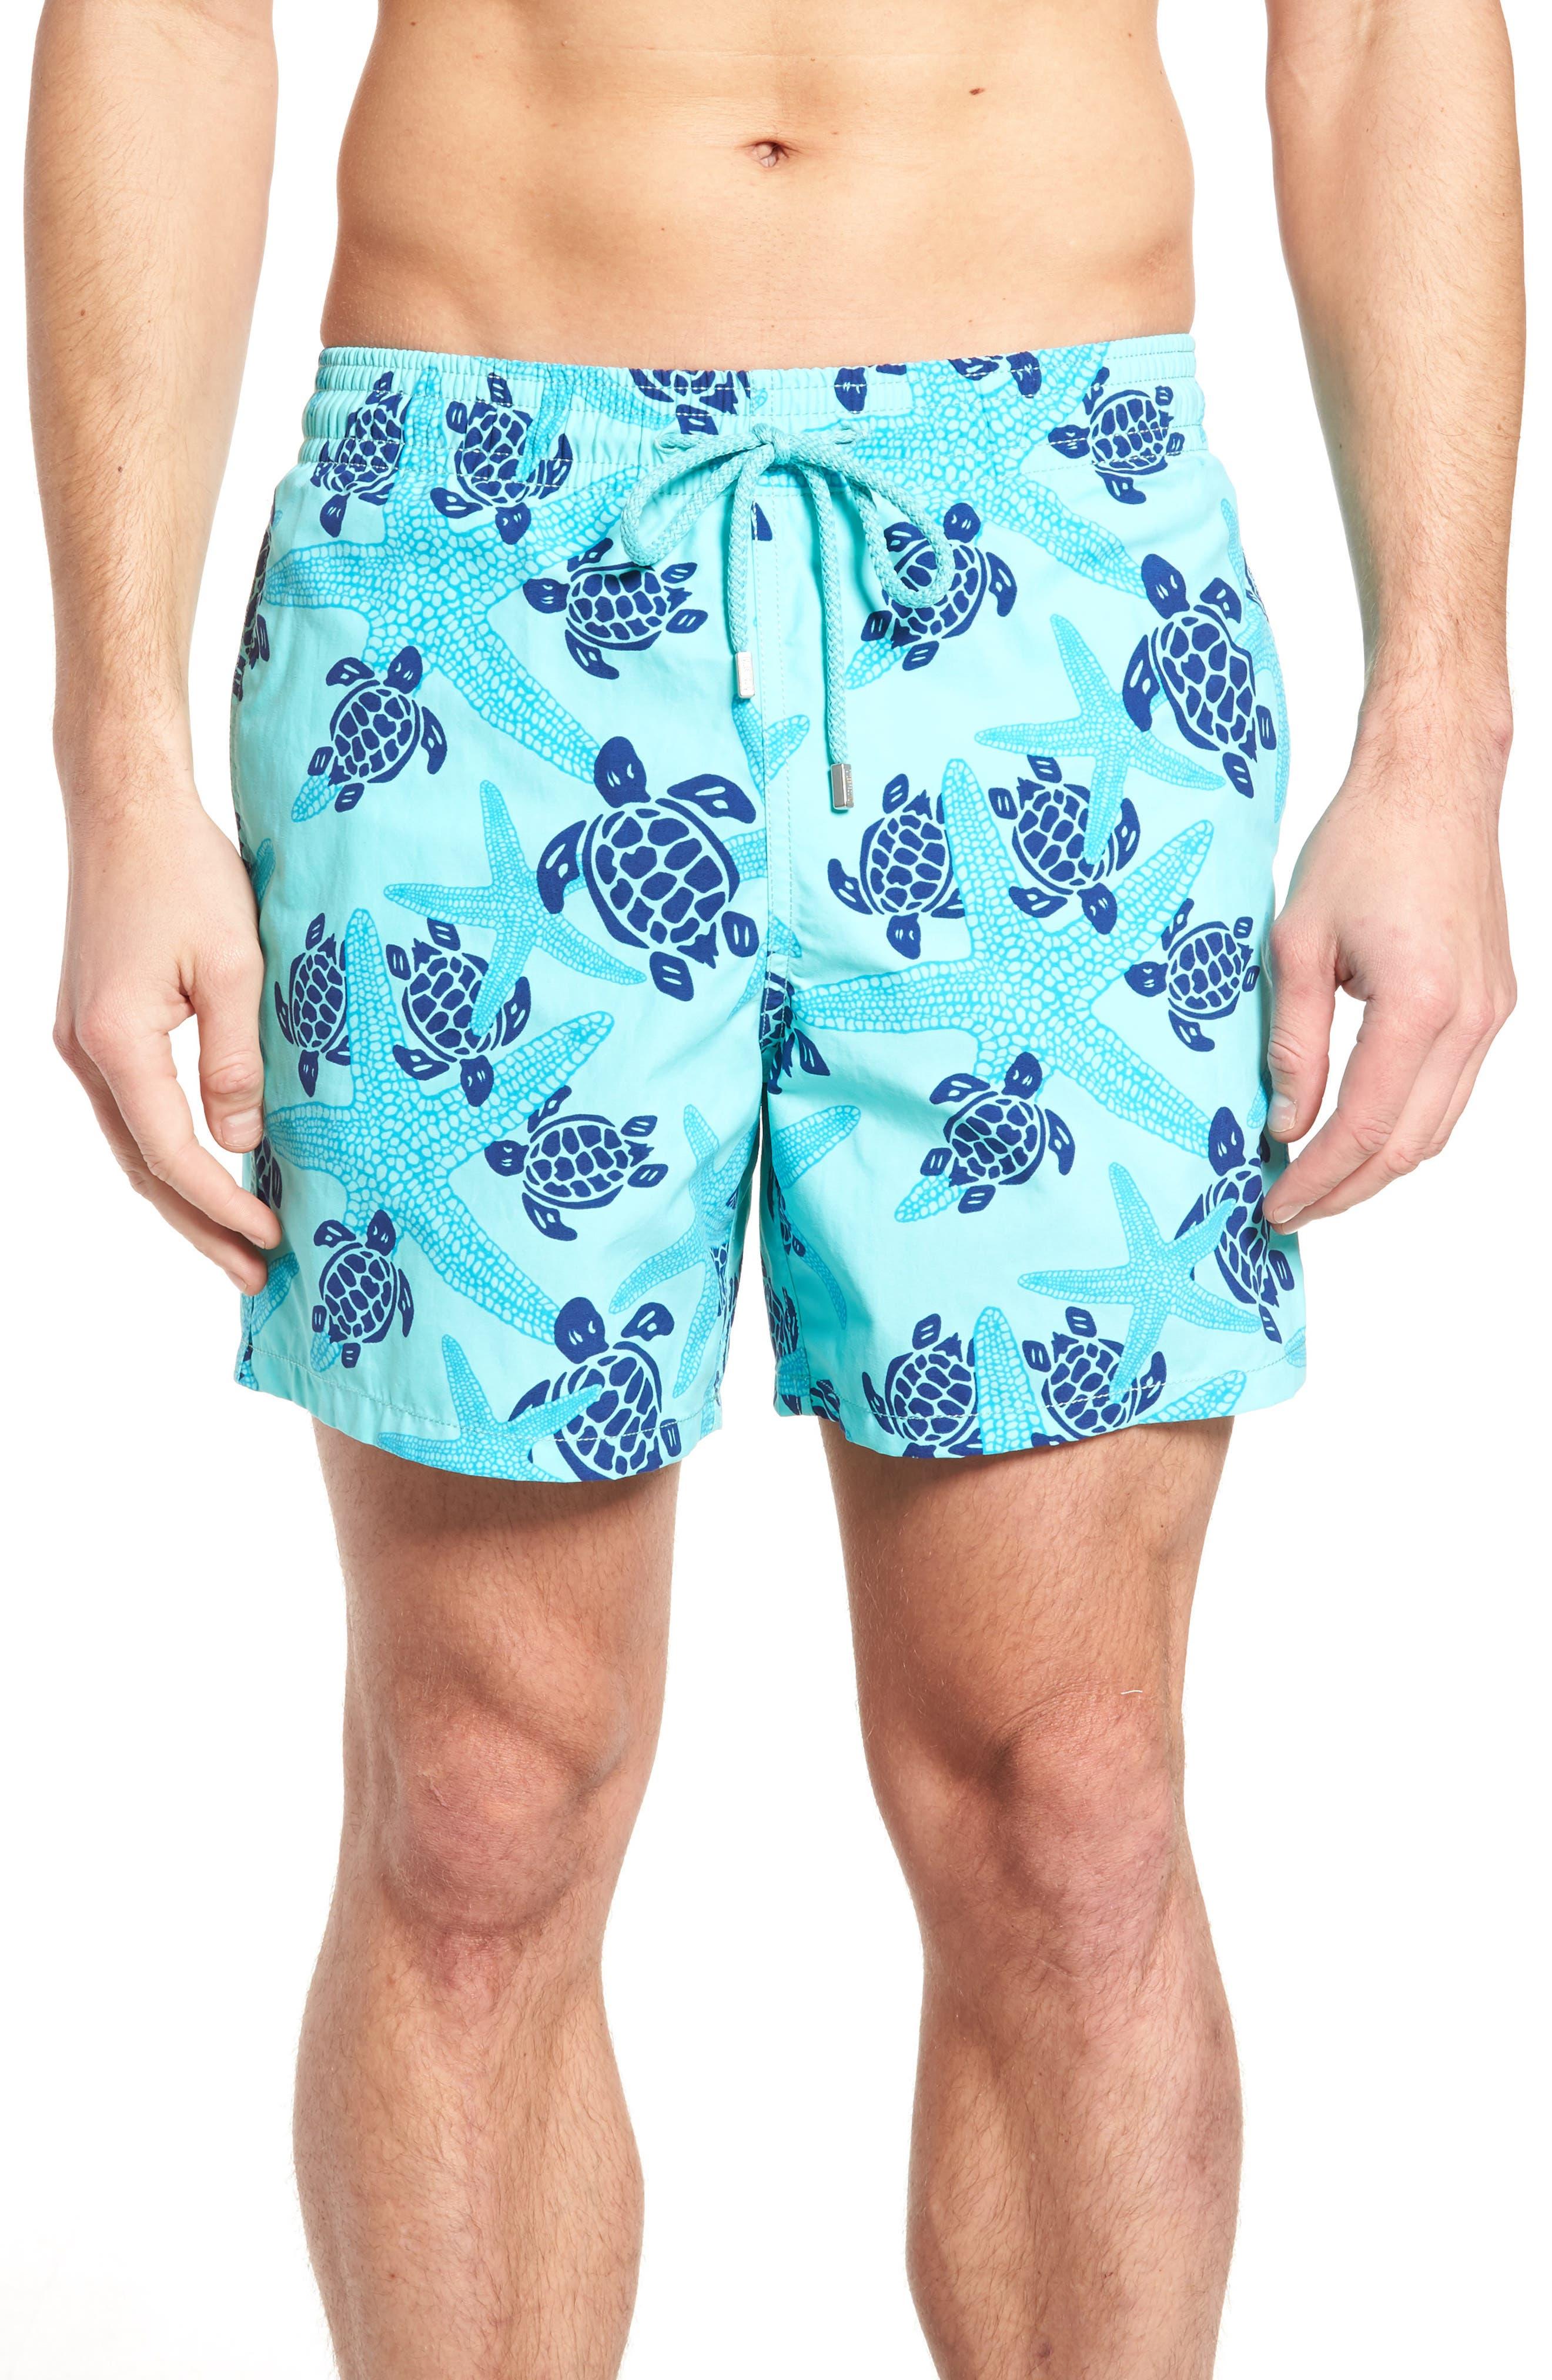 Vilebrequin Starlettes & Turtles Swim Trunks, Blue